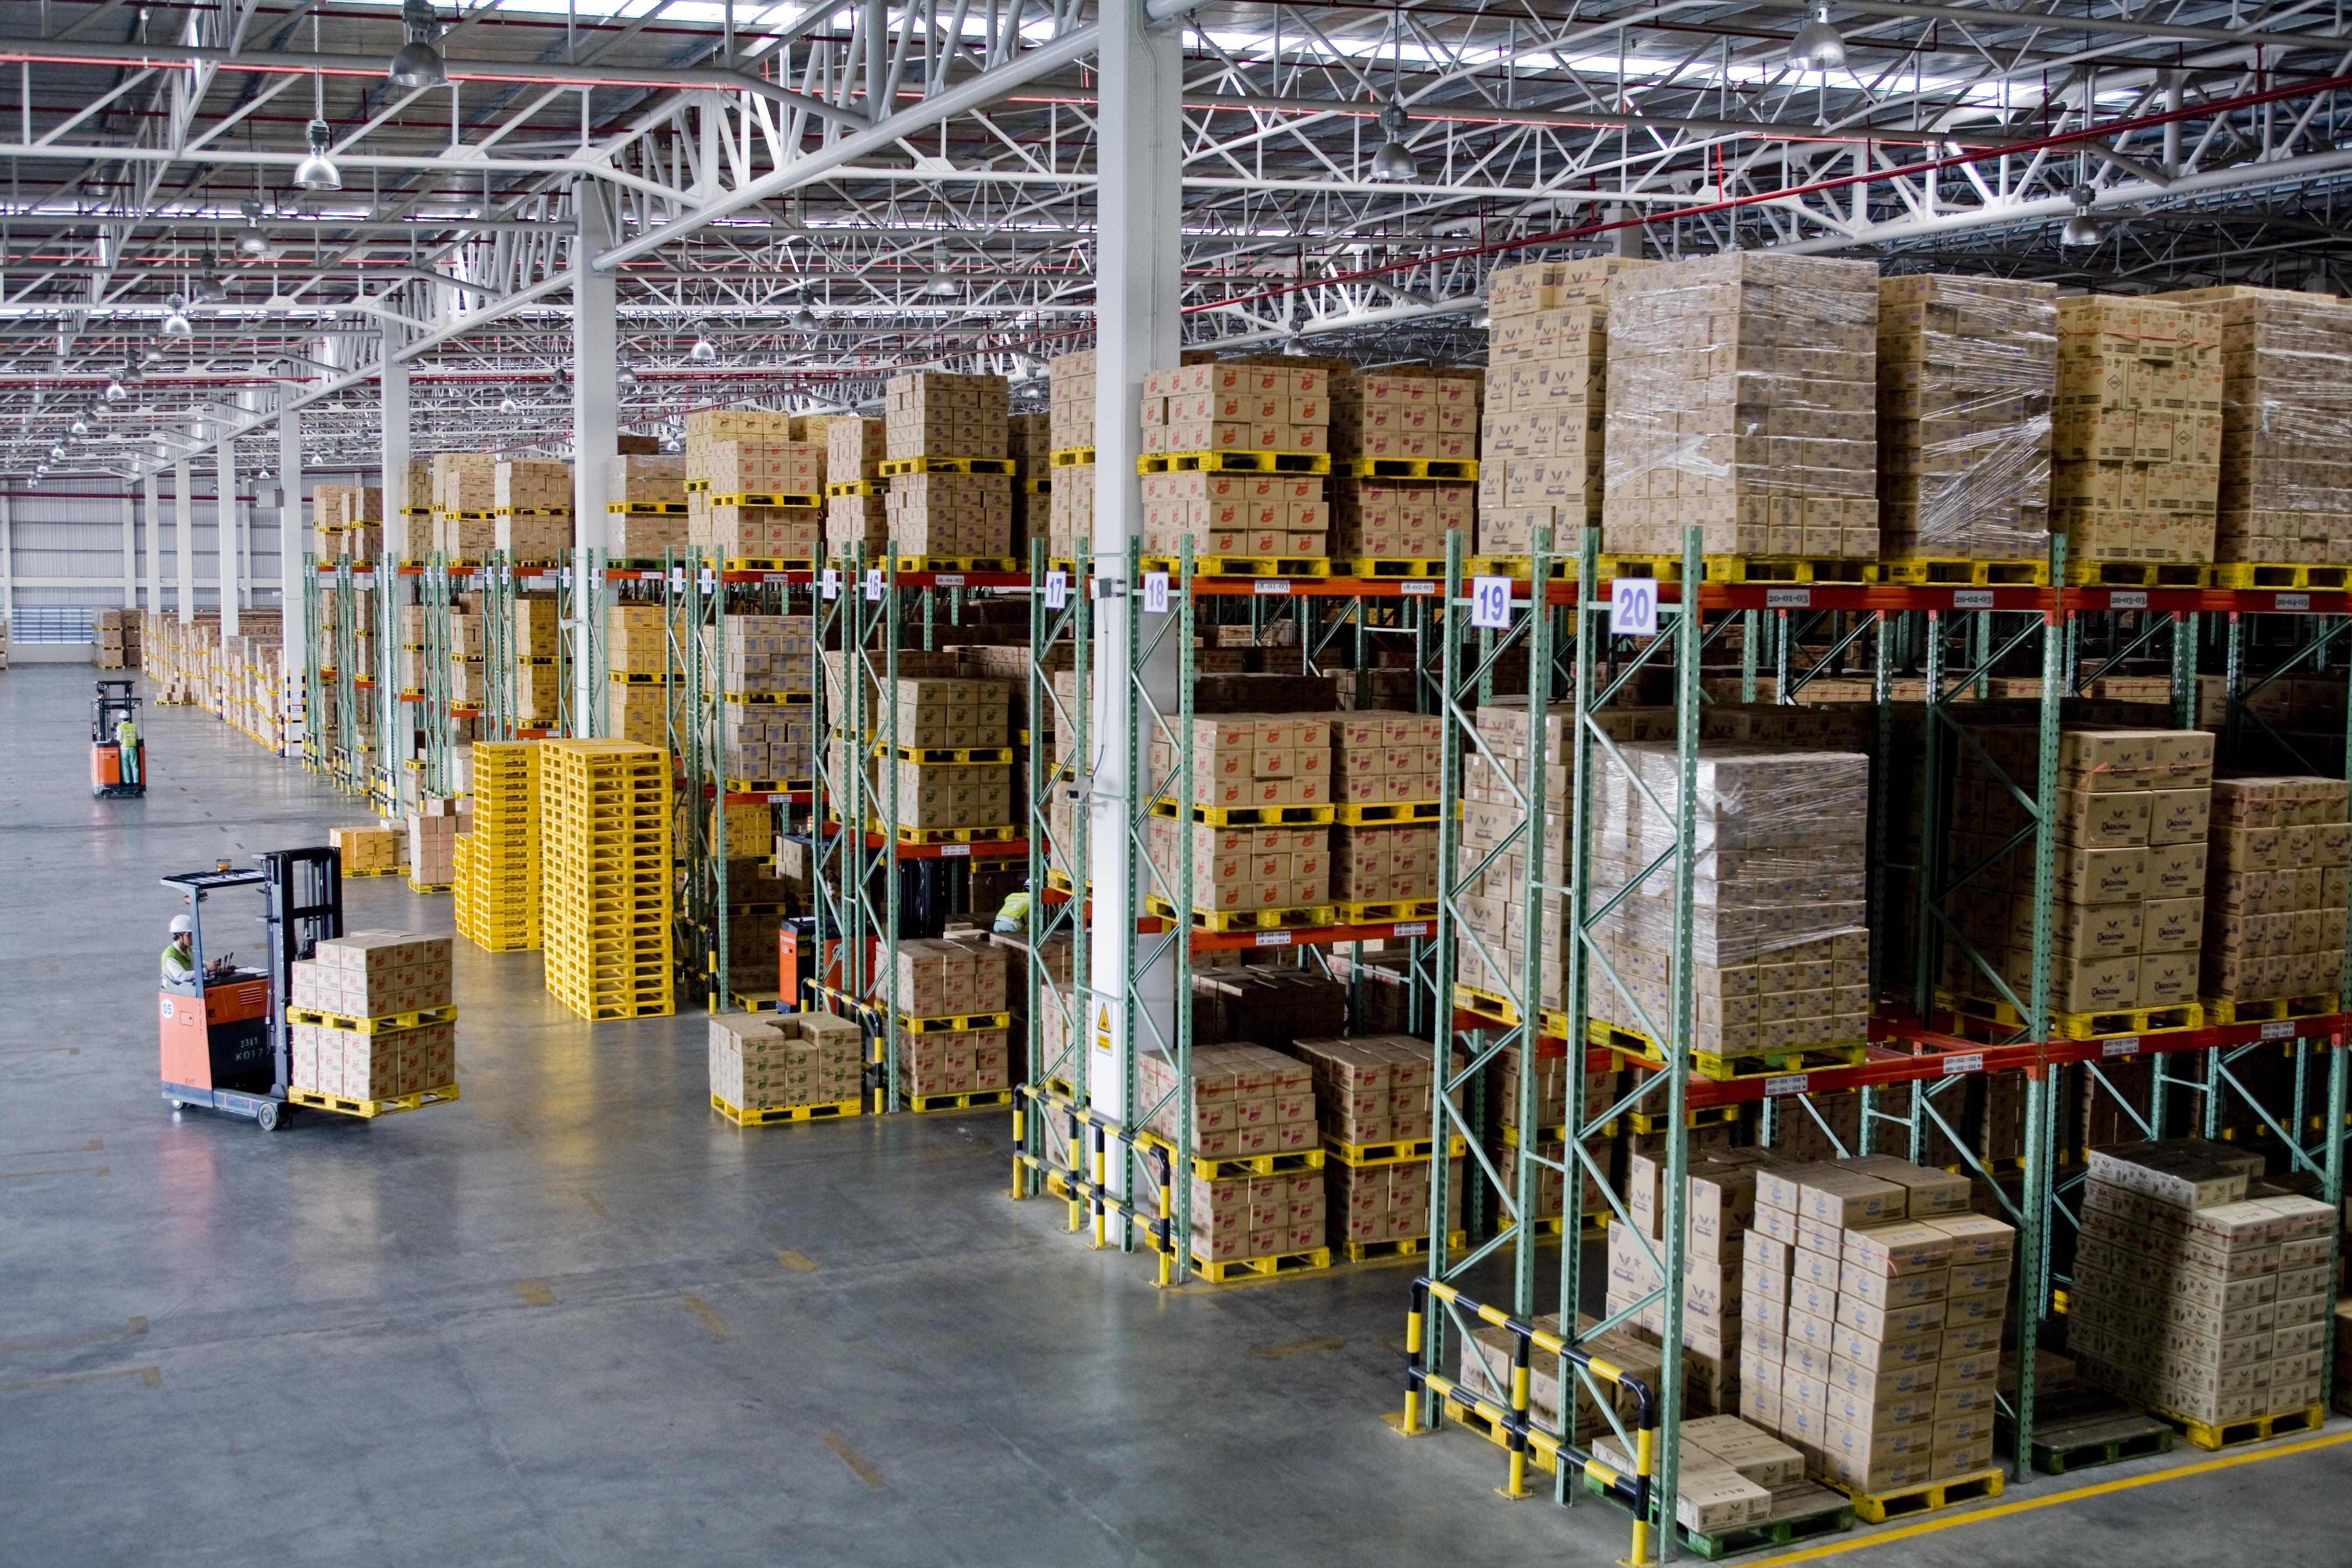 warehouse incentive plan image-1.jpg